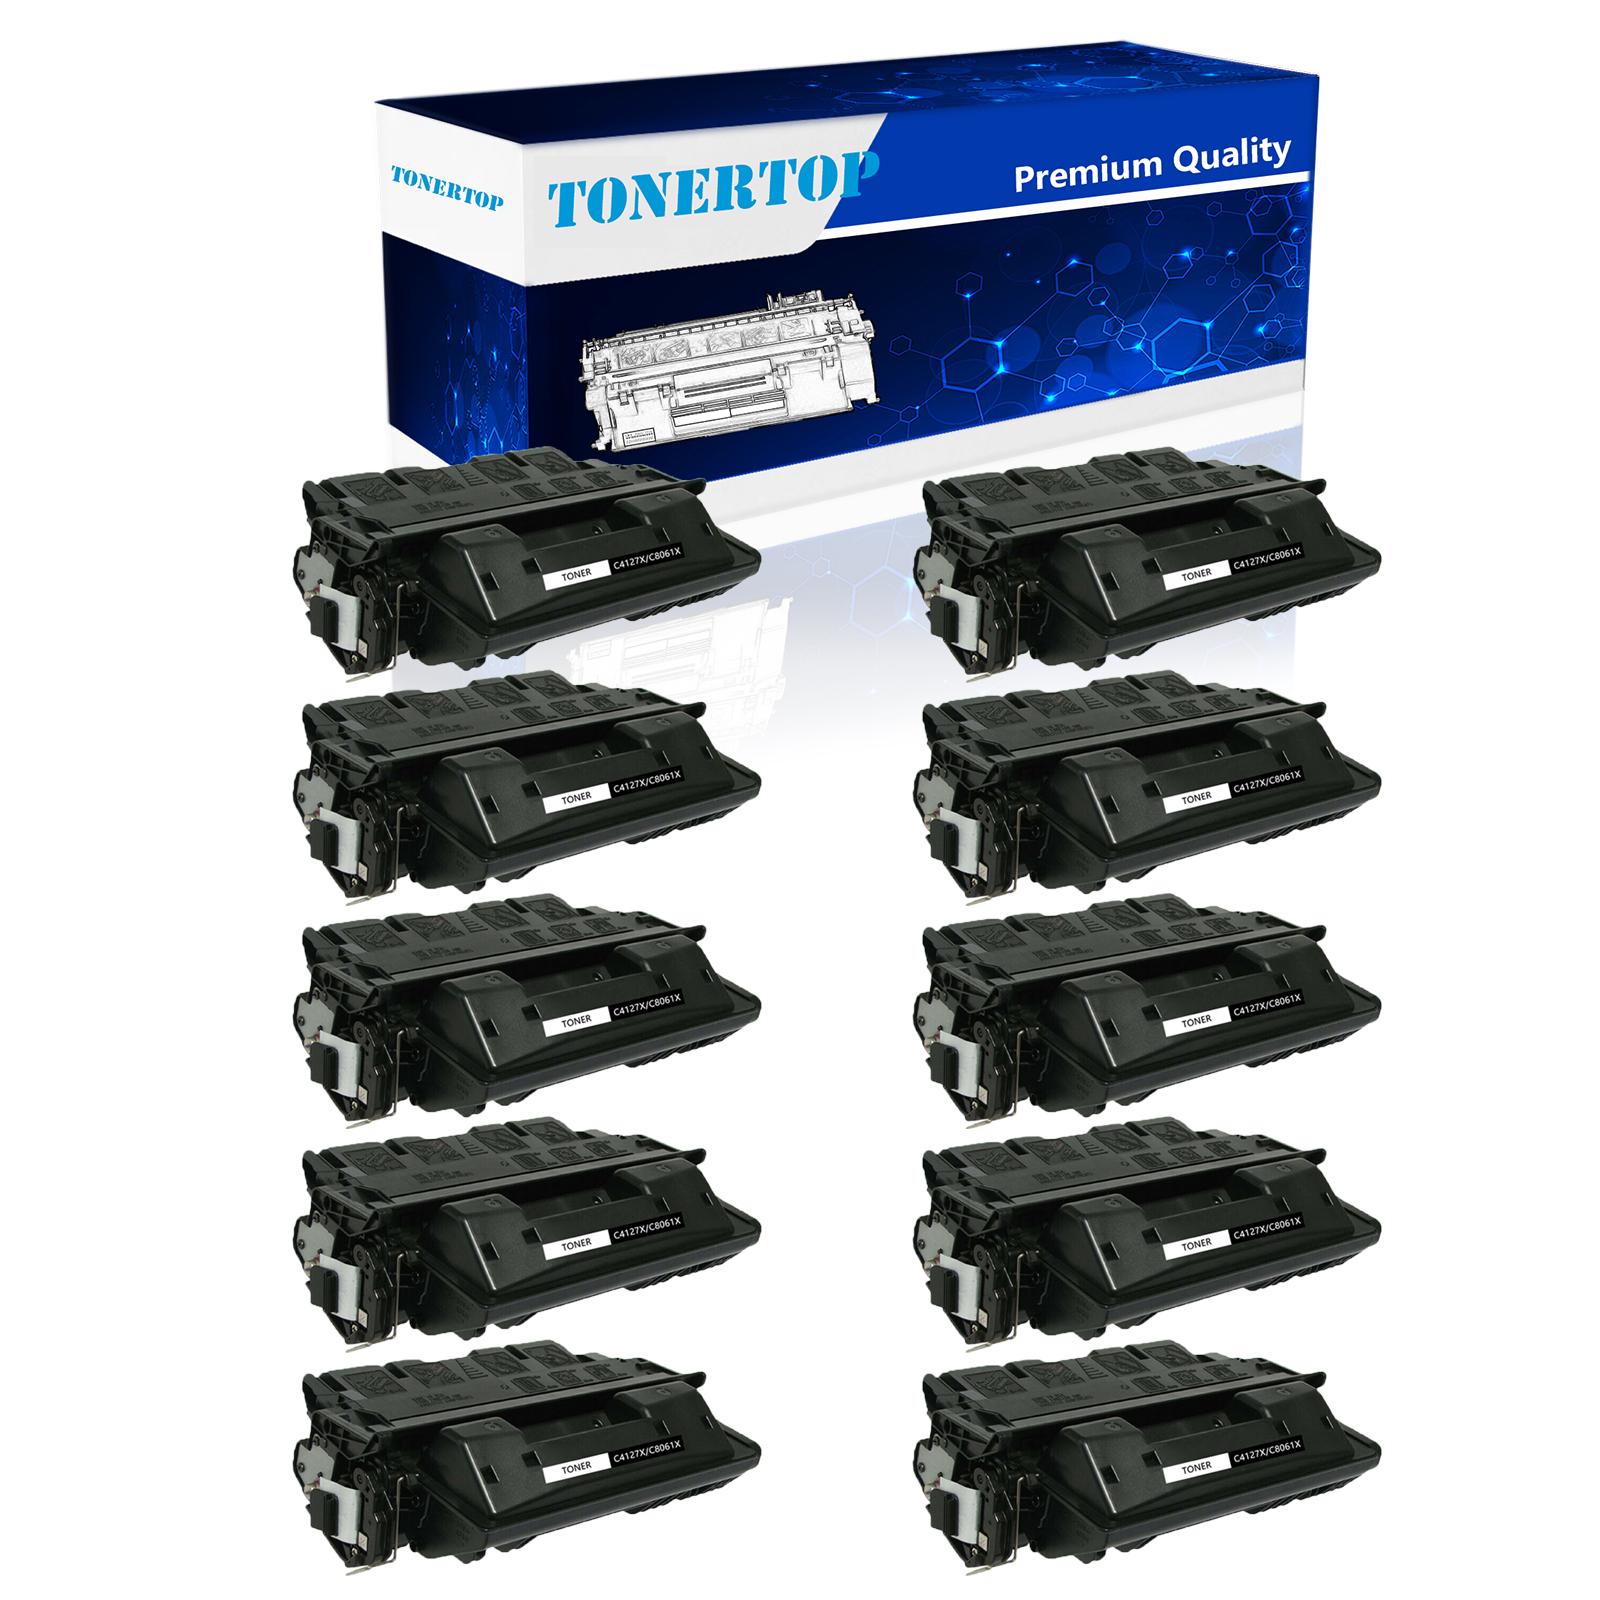 6 PK C4127X  27X Toner Cartridge High Yield Compatible For HP LaserJet 4000 4050